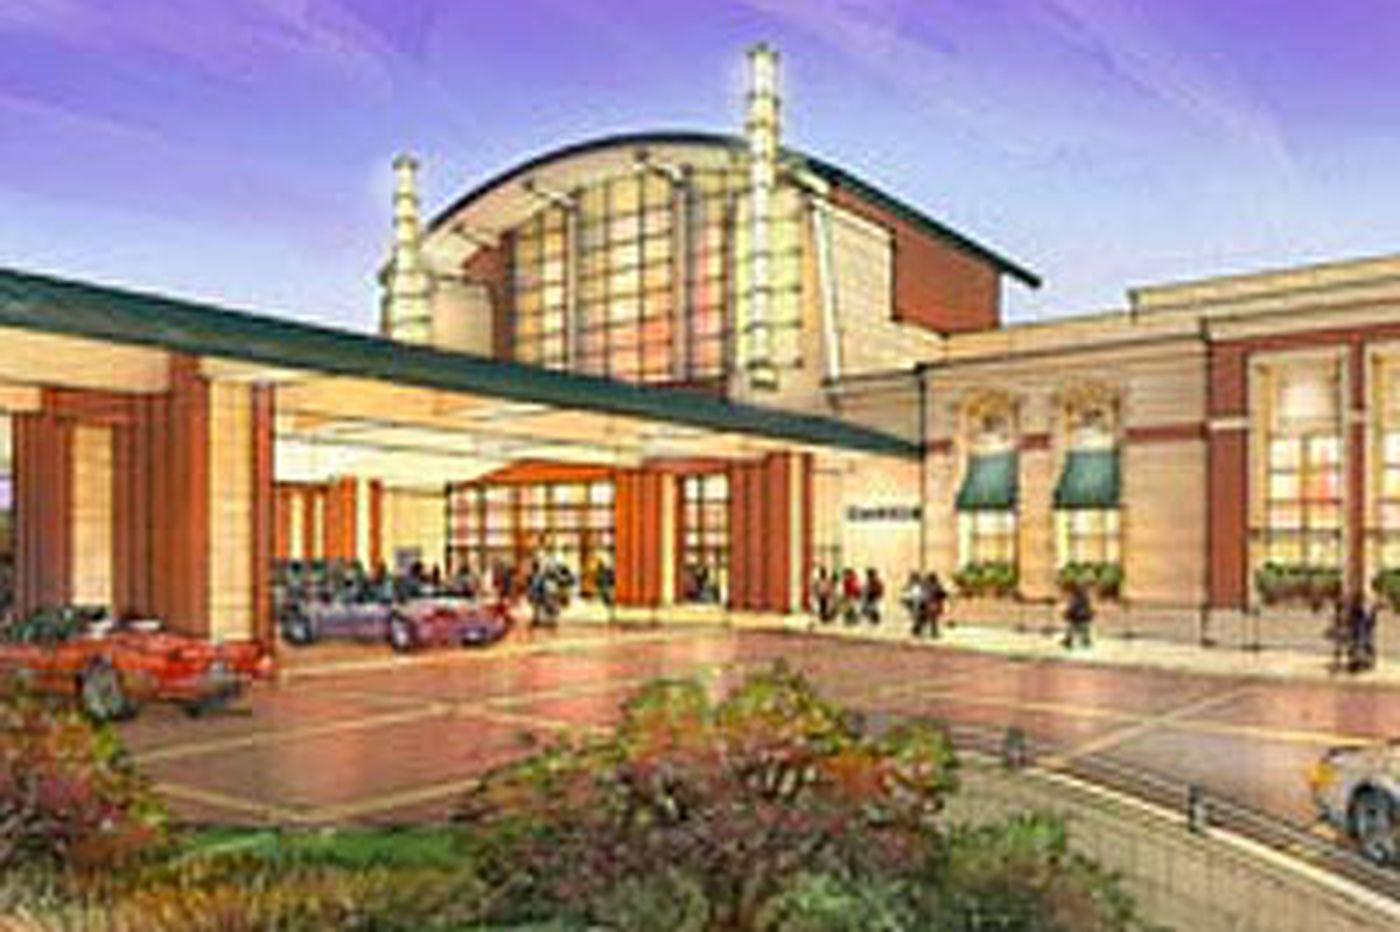 Pa. revokes Foxwoods' casino license